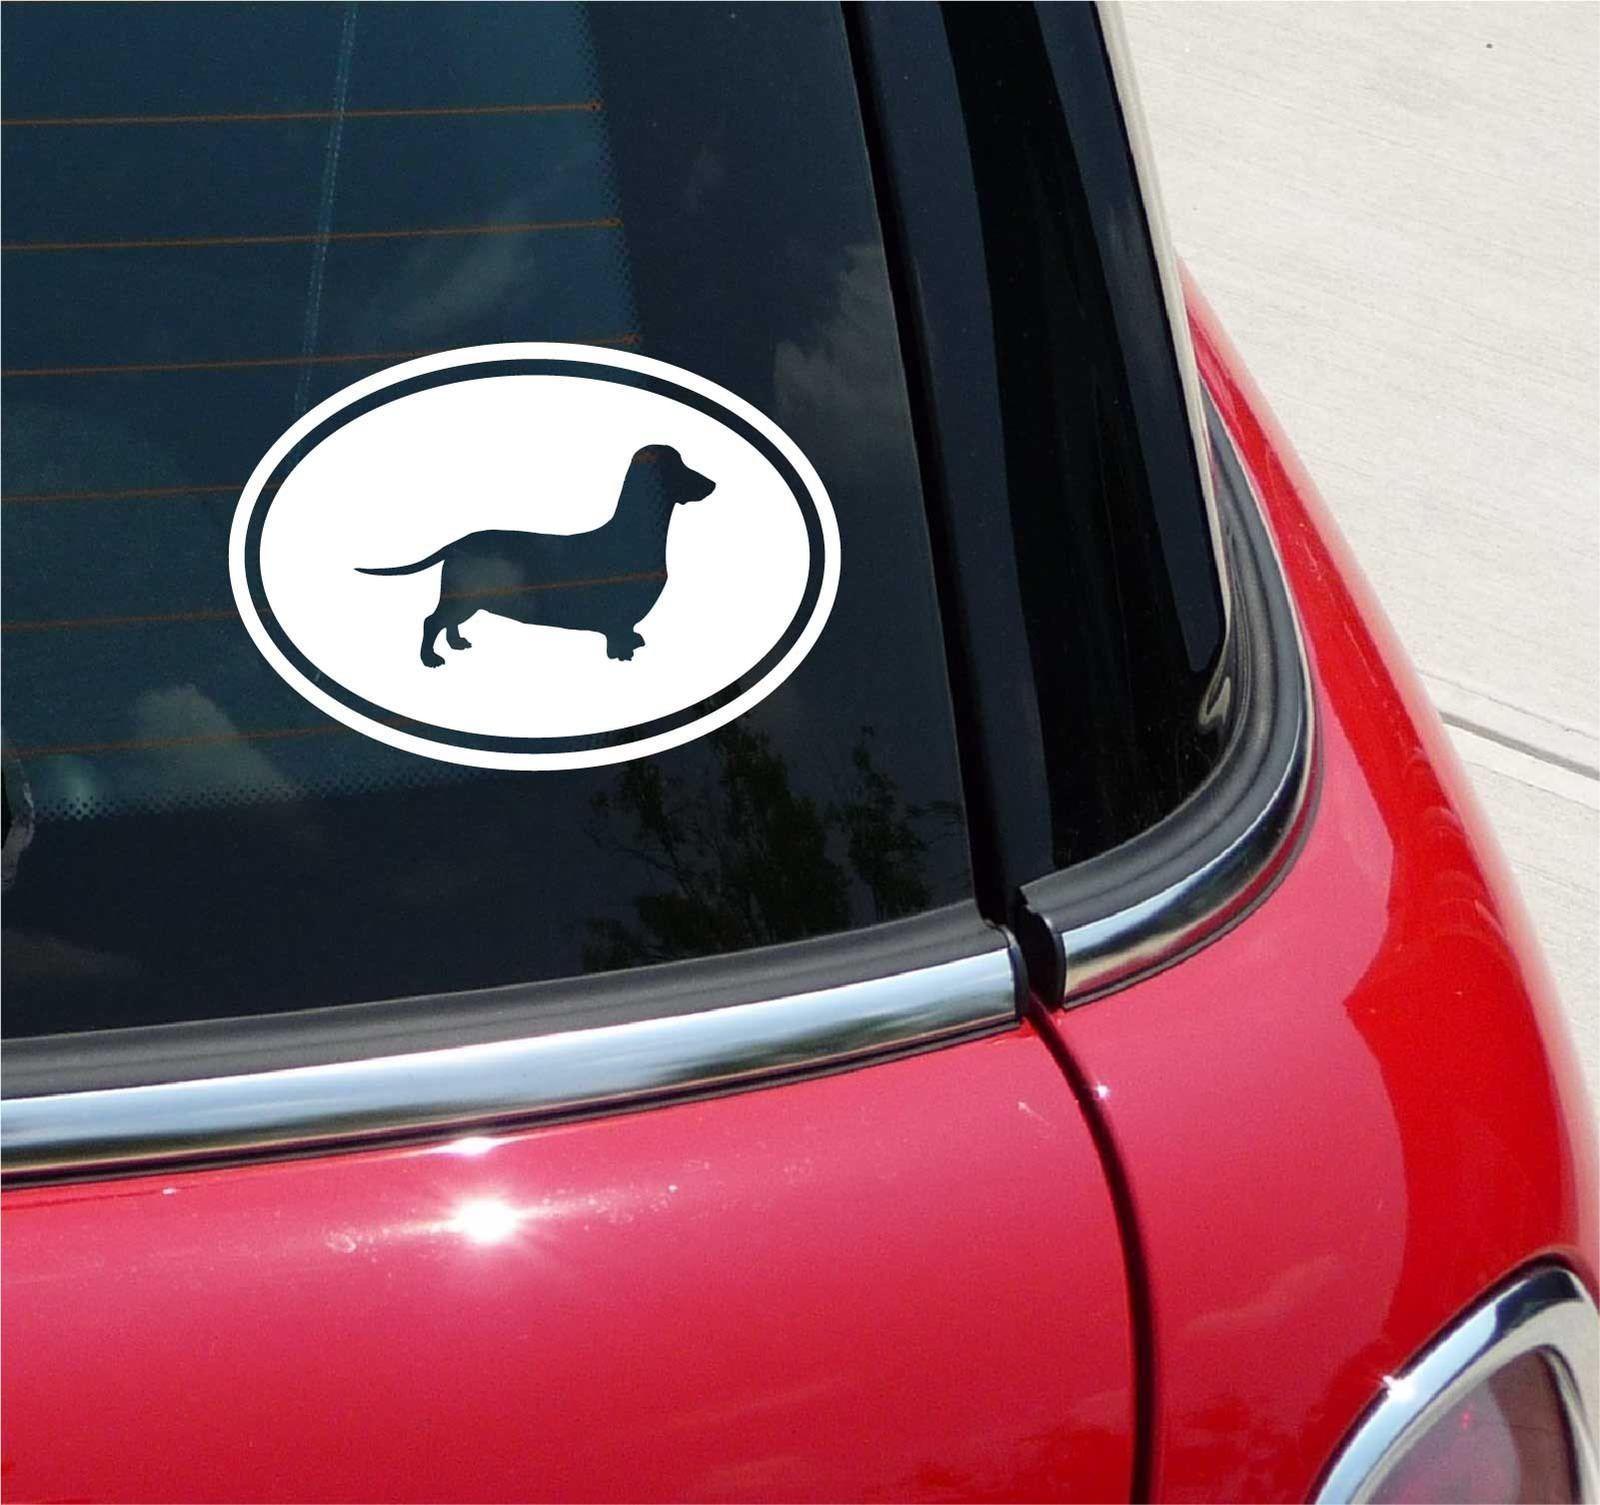 1 95 Dachshund Dachshunds Doxie Dog Graphic Decal Sticker Art Car Wall Euro Oval Ebay Home Garden Sticker Art Car Stickers Vinyl Decal Stickers [ 1505 x 1600 Pixel ]